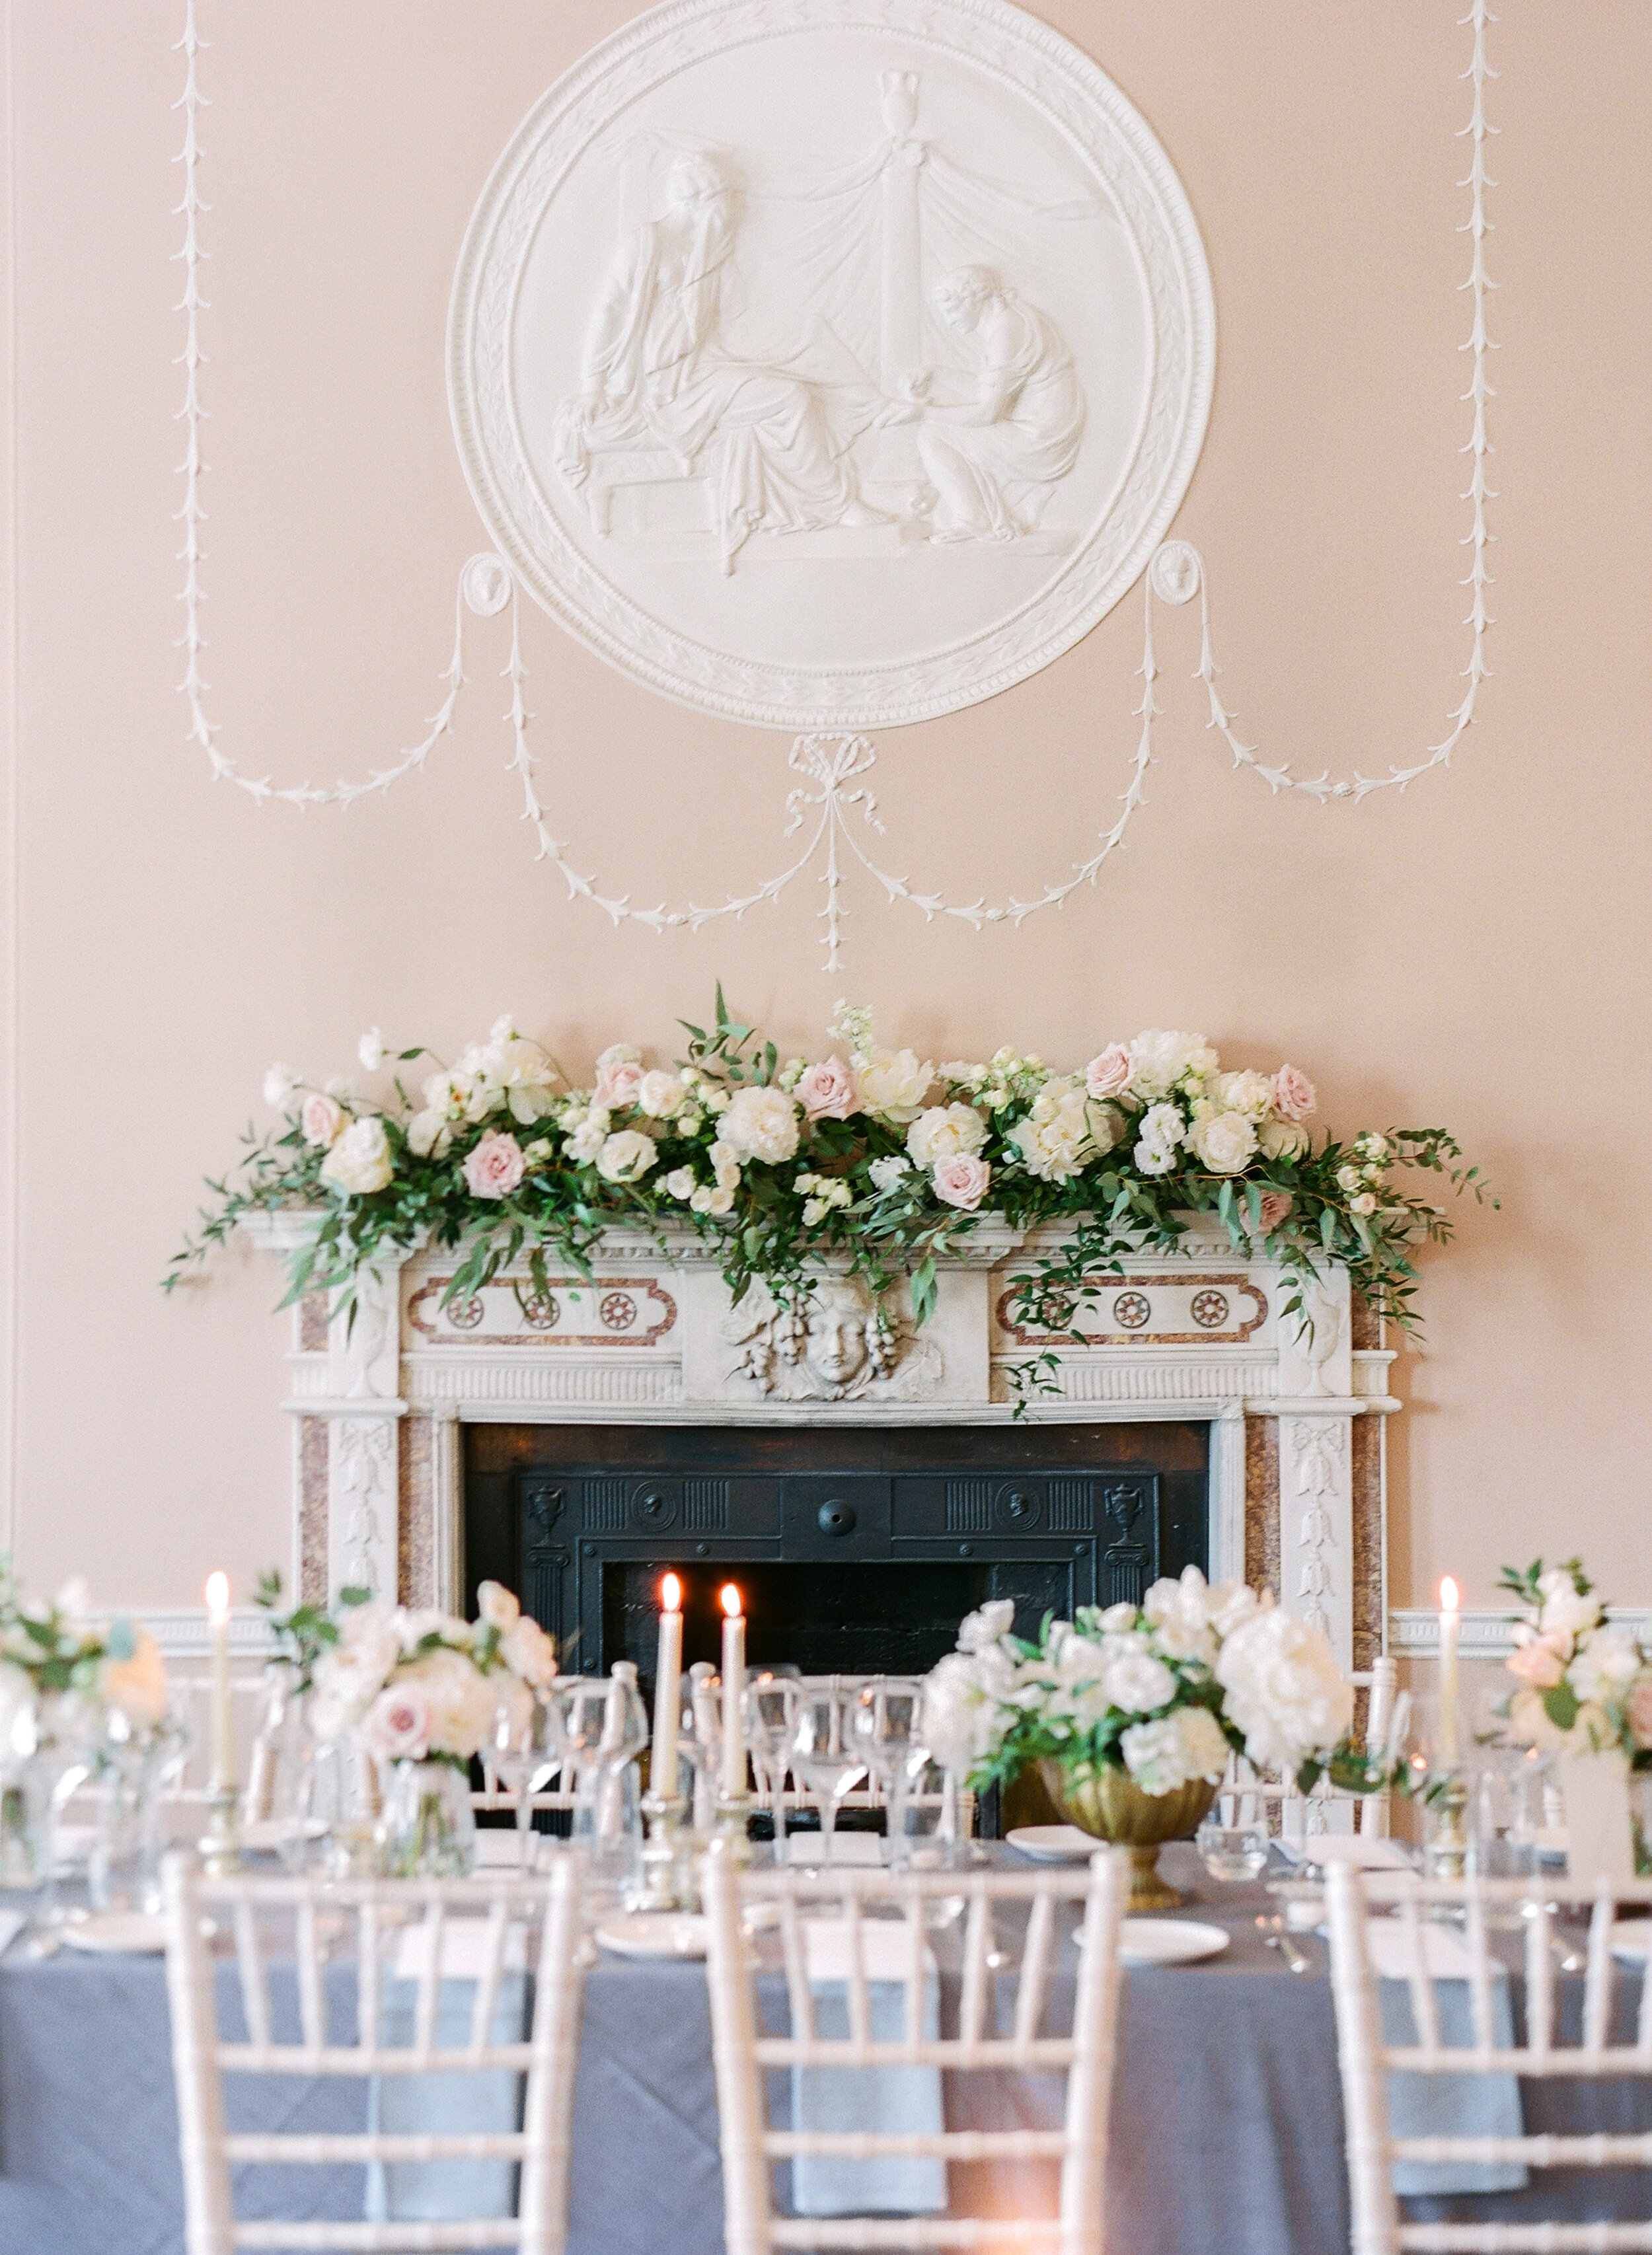 Bella-Botanica-Flowers-Molly-Carr-Photography-Reception-Mantlepiece-Florals-173.JPG